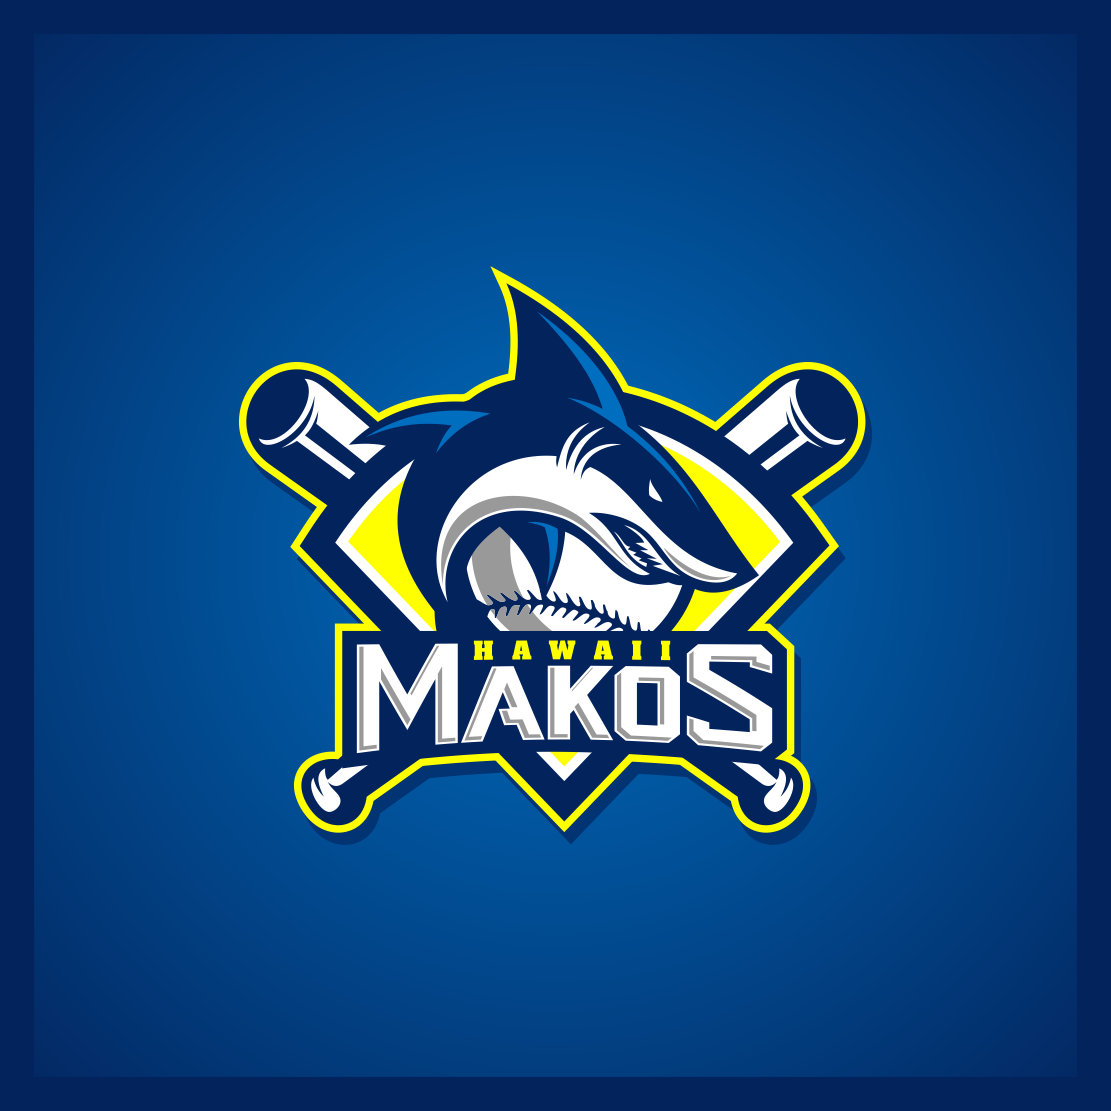 Mako's Hawaii Logo | Logo Ideas & Inspiration | Sports logo